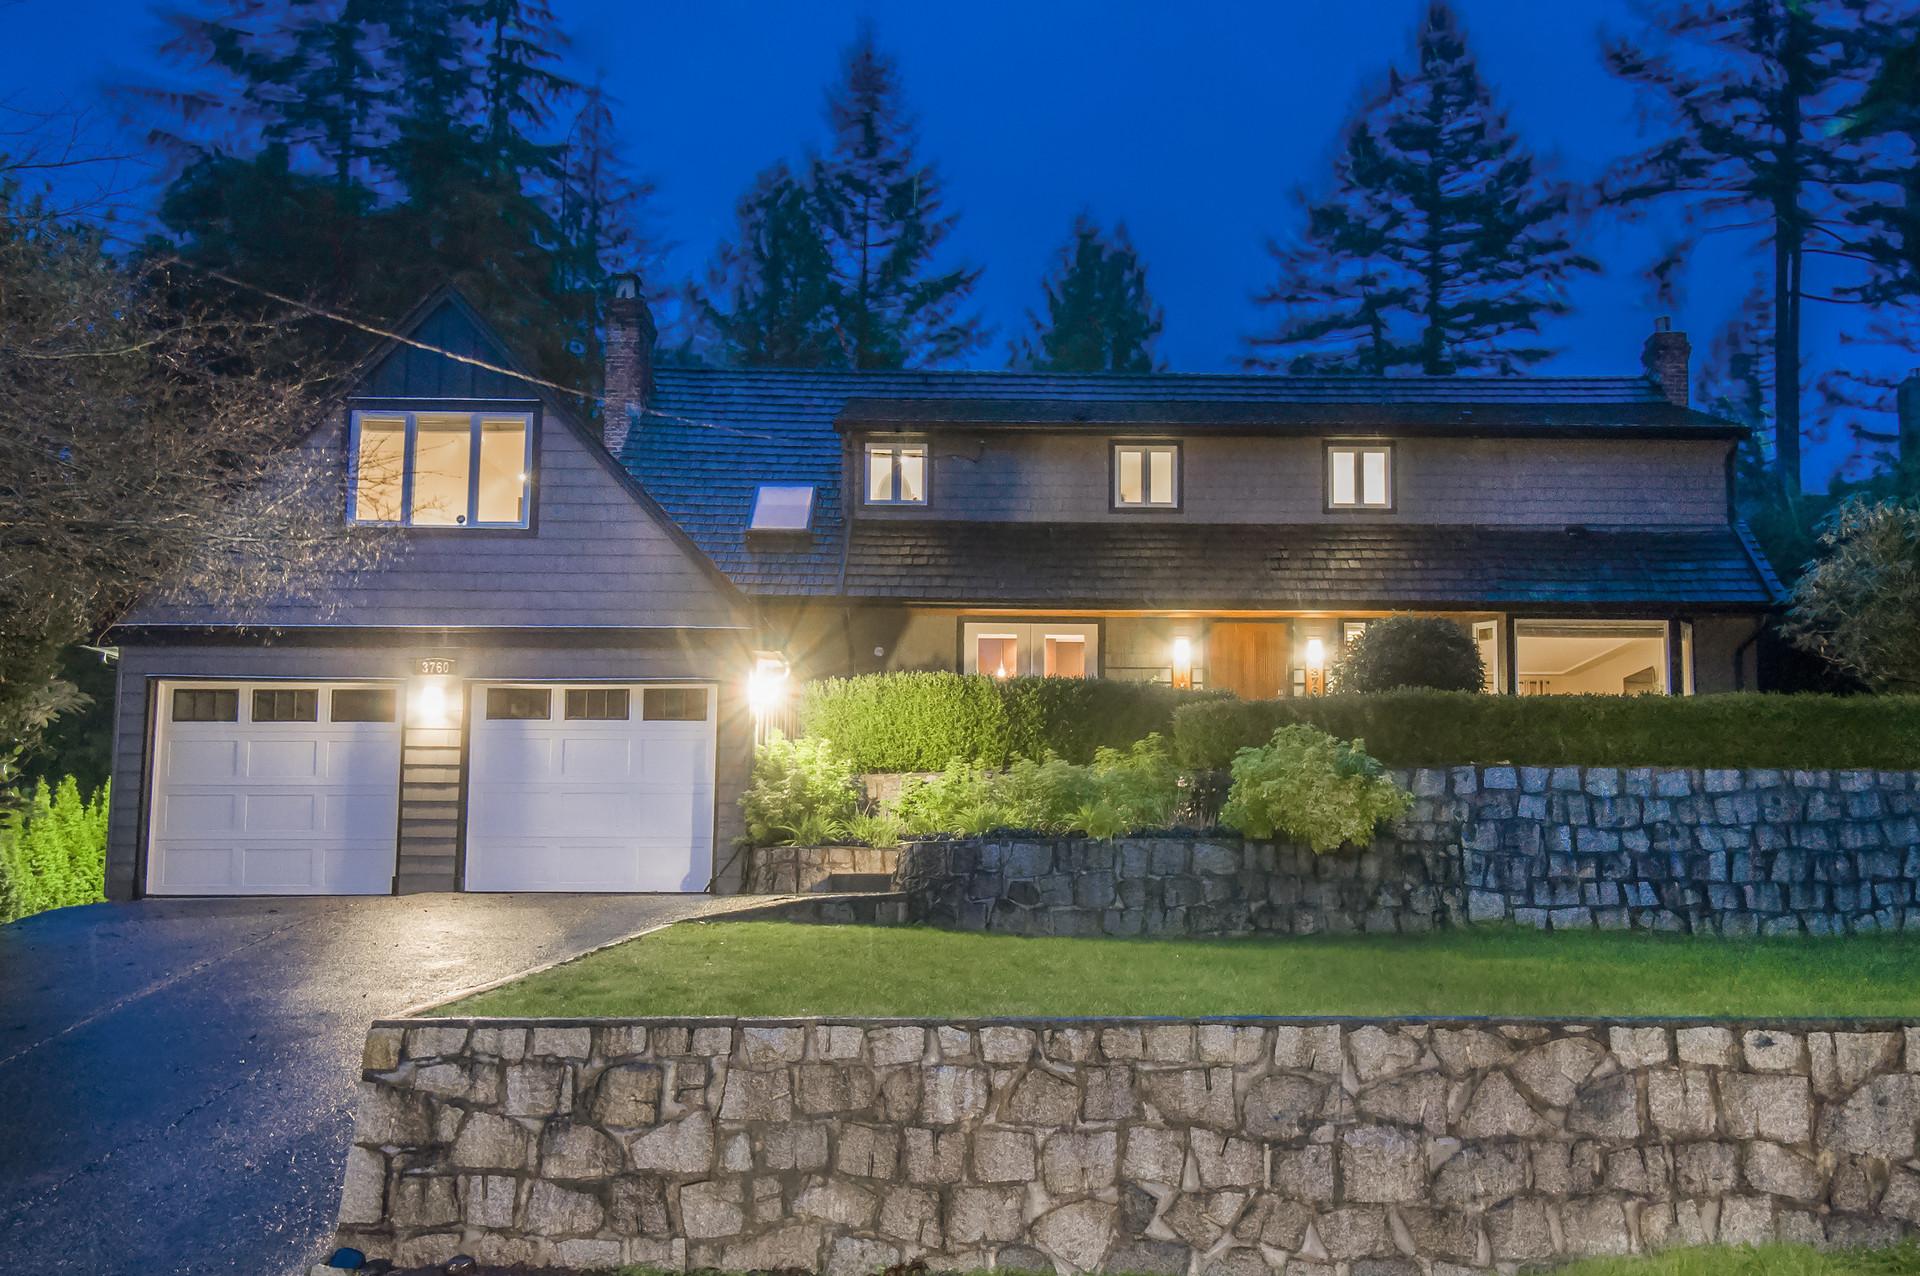 001-1 at 3760 Bayridge Avenue, Bayridge, West Vancouver